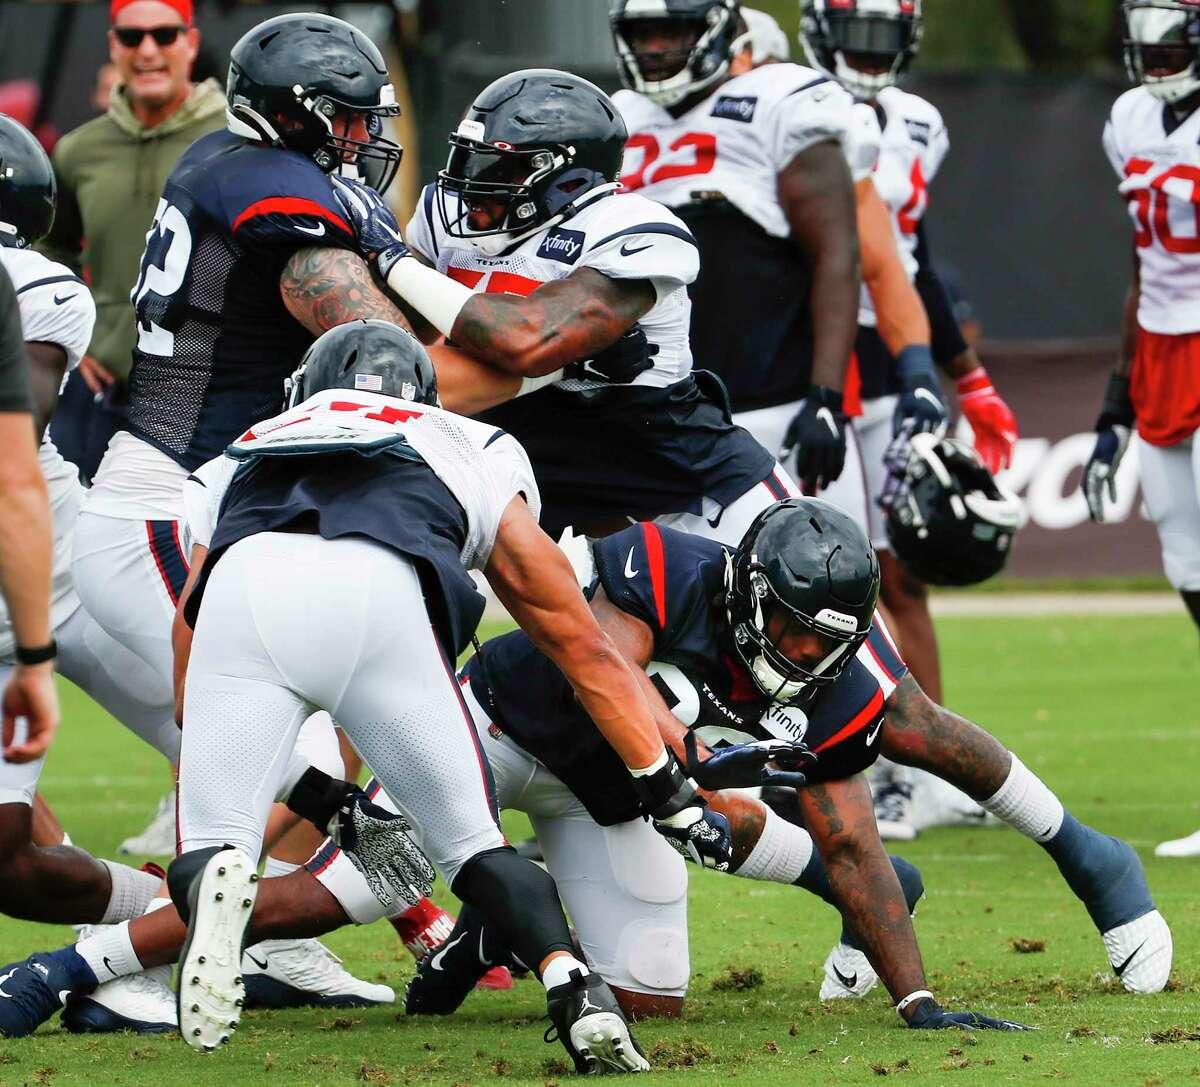 Houston Texans linebacker Benardrick McKinney (55) goes up against offensive tackle Rick Leonard (72) during an NFL training camp football practice Monday, Aug. 17, 2020, at The Houston Methodist Training Center in Houston.